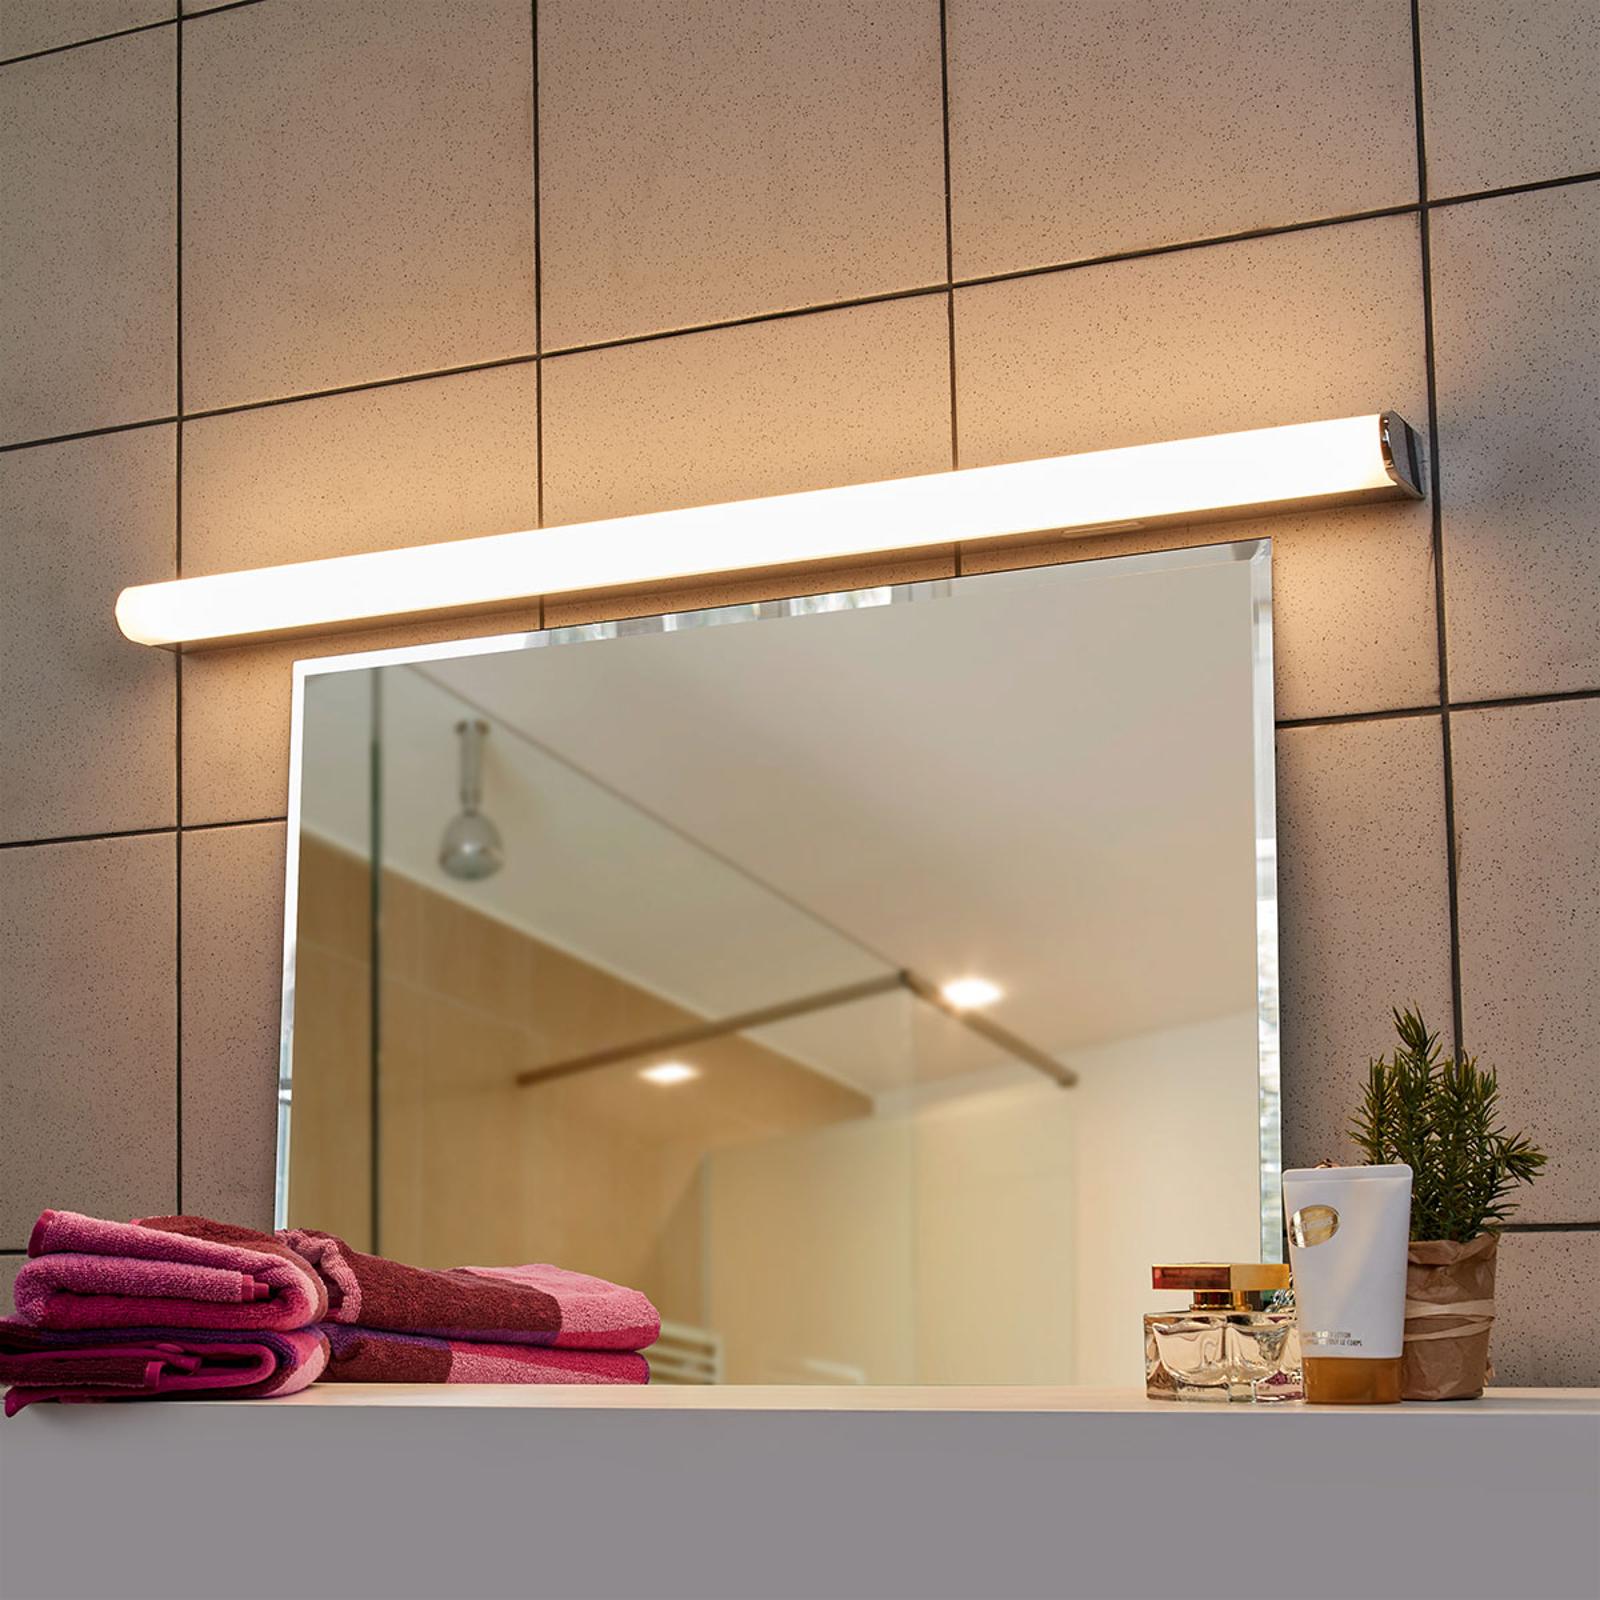 Jesko LED-væglampe 3.000-6.500 K, 89cm